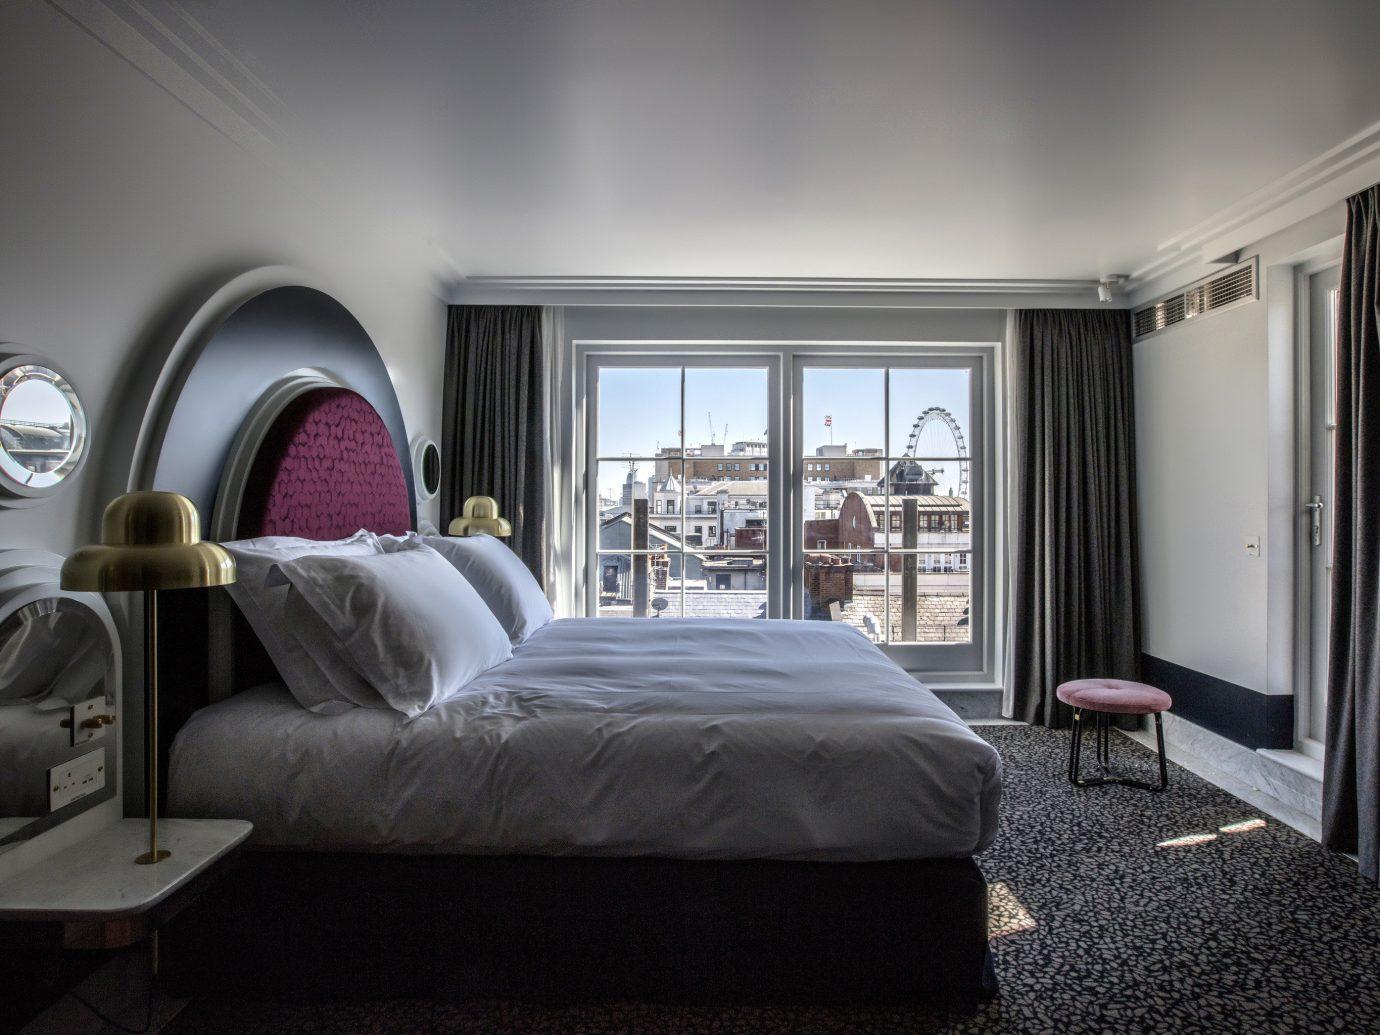 Boutique Hotels London Romantic Hotels indoor wall bed floor room window interior design Bedroom ceiling hotel furniture home Suite bed frame mattress